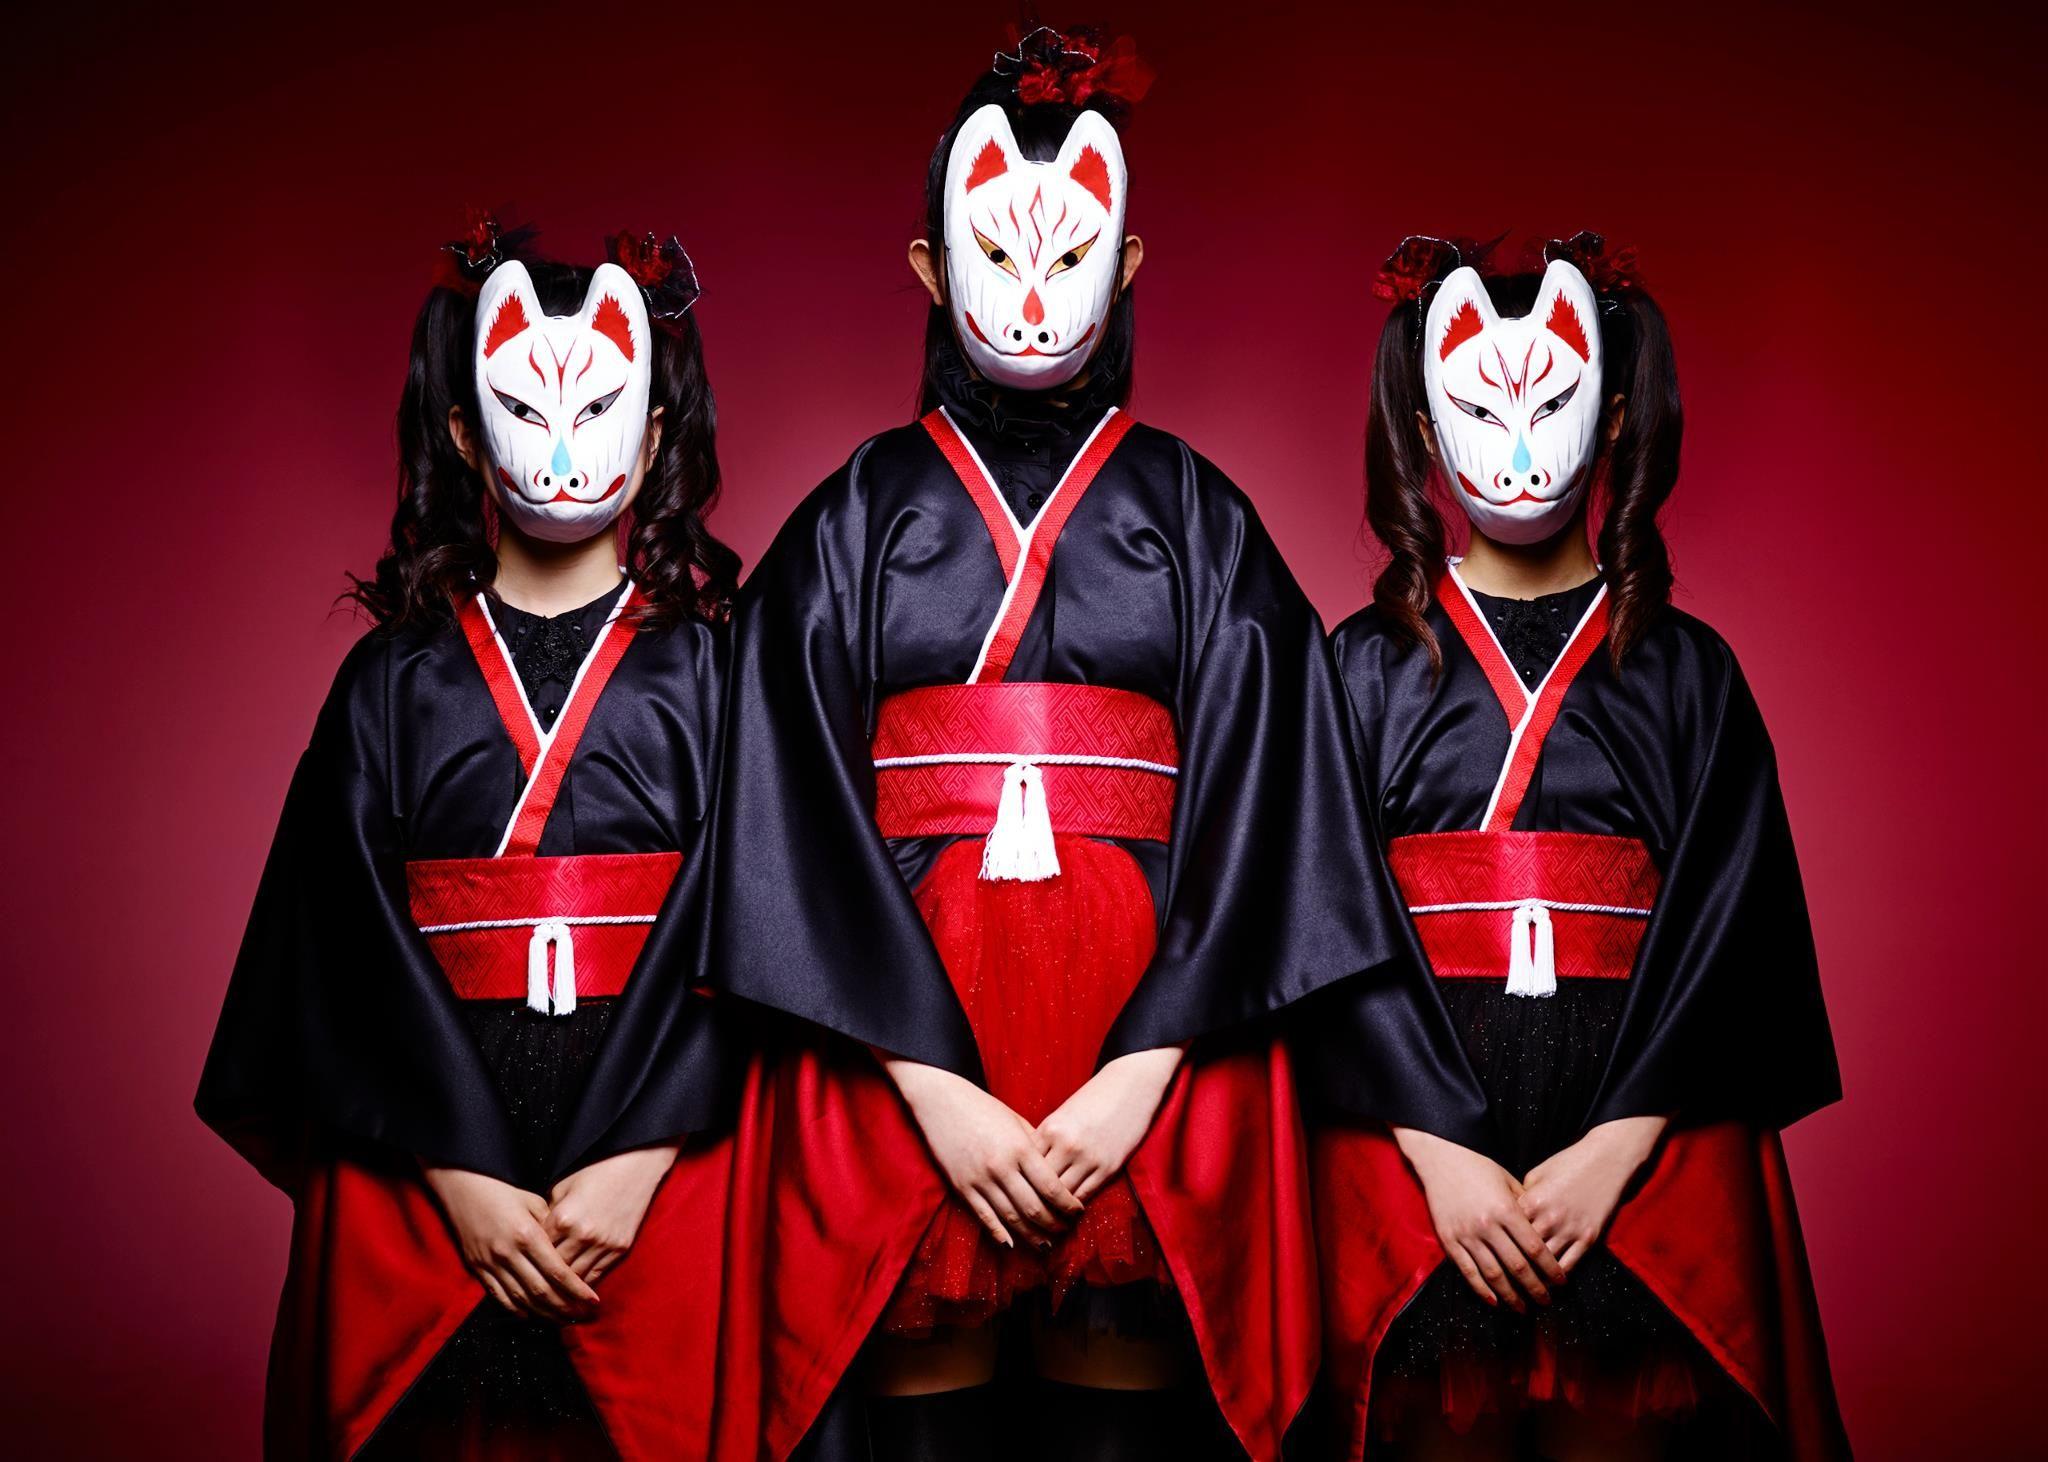 baby metal to release their new single megitsune release on june 19 kitsune mask kitsune kawaii girl